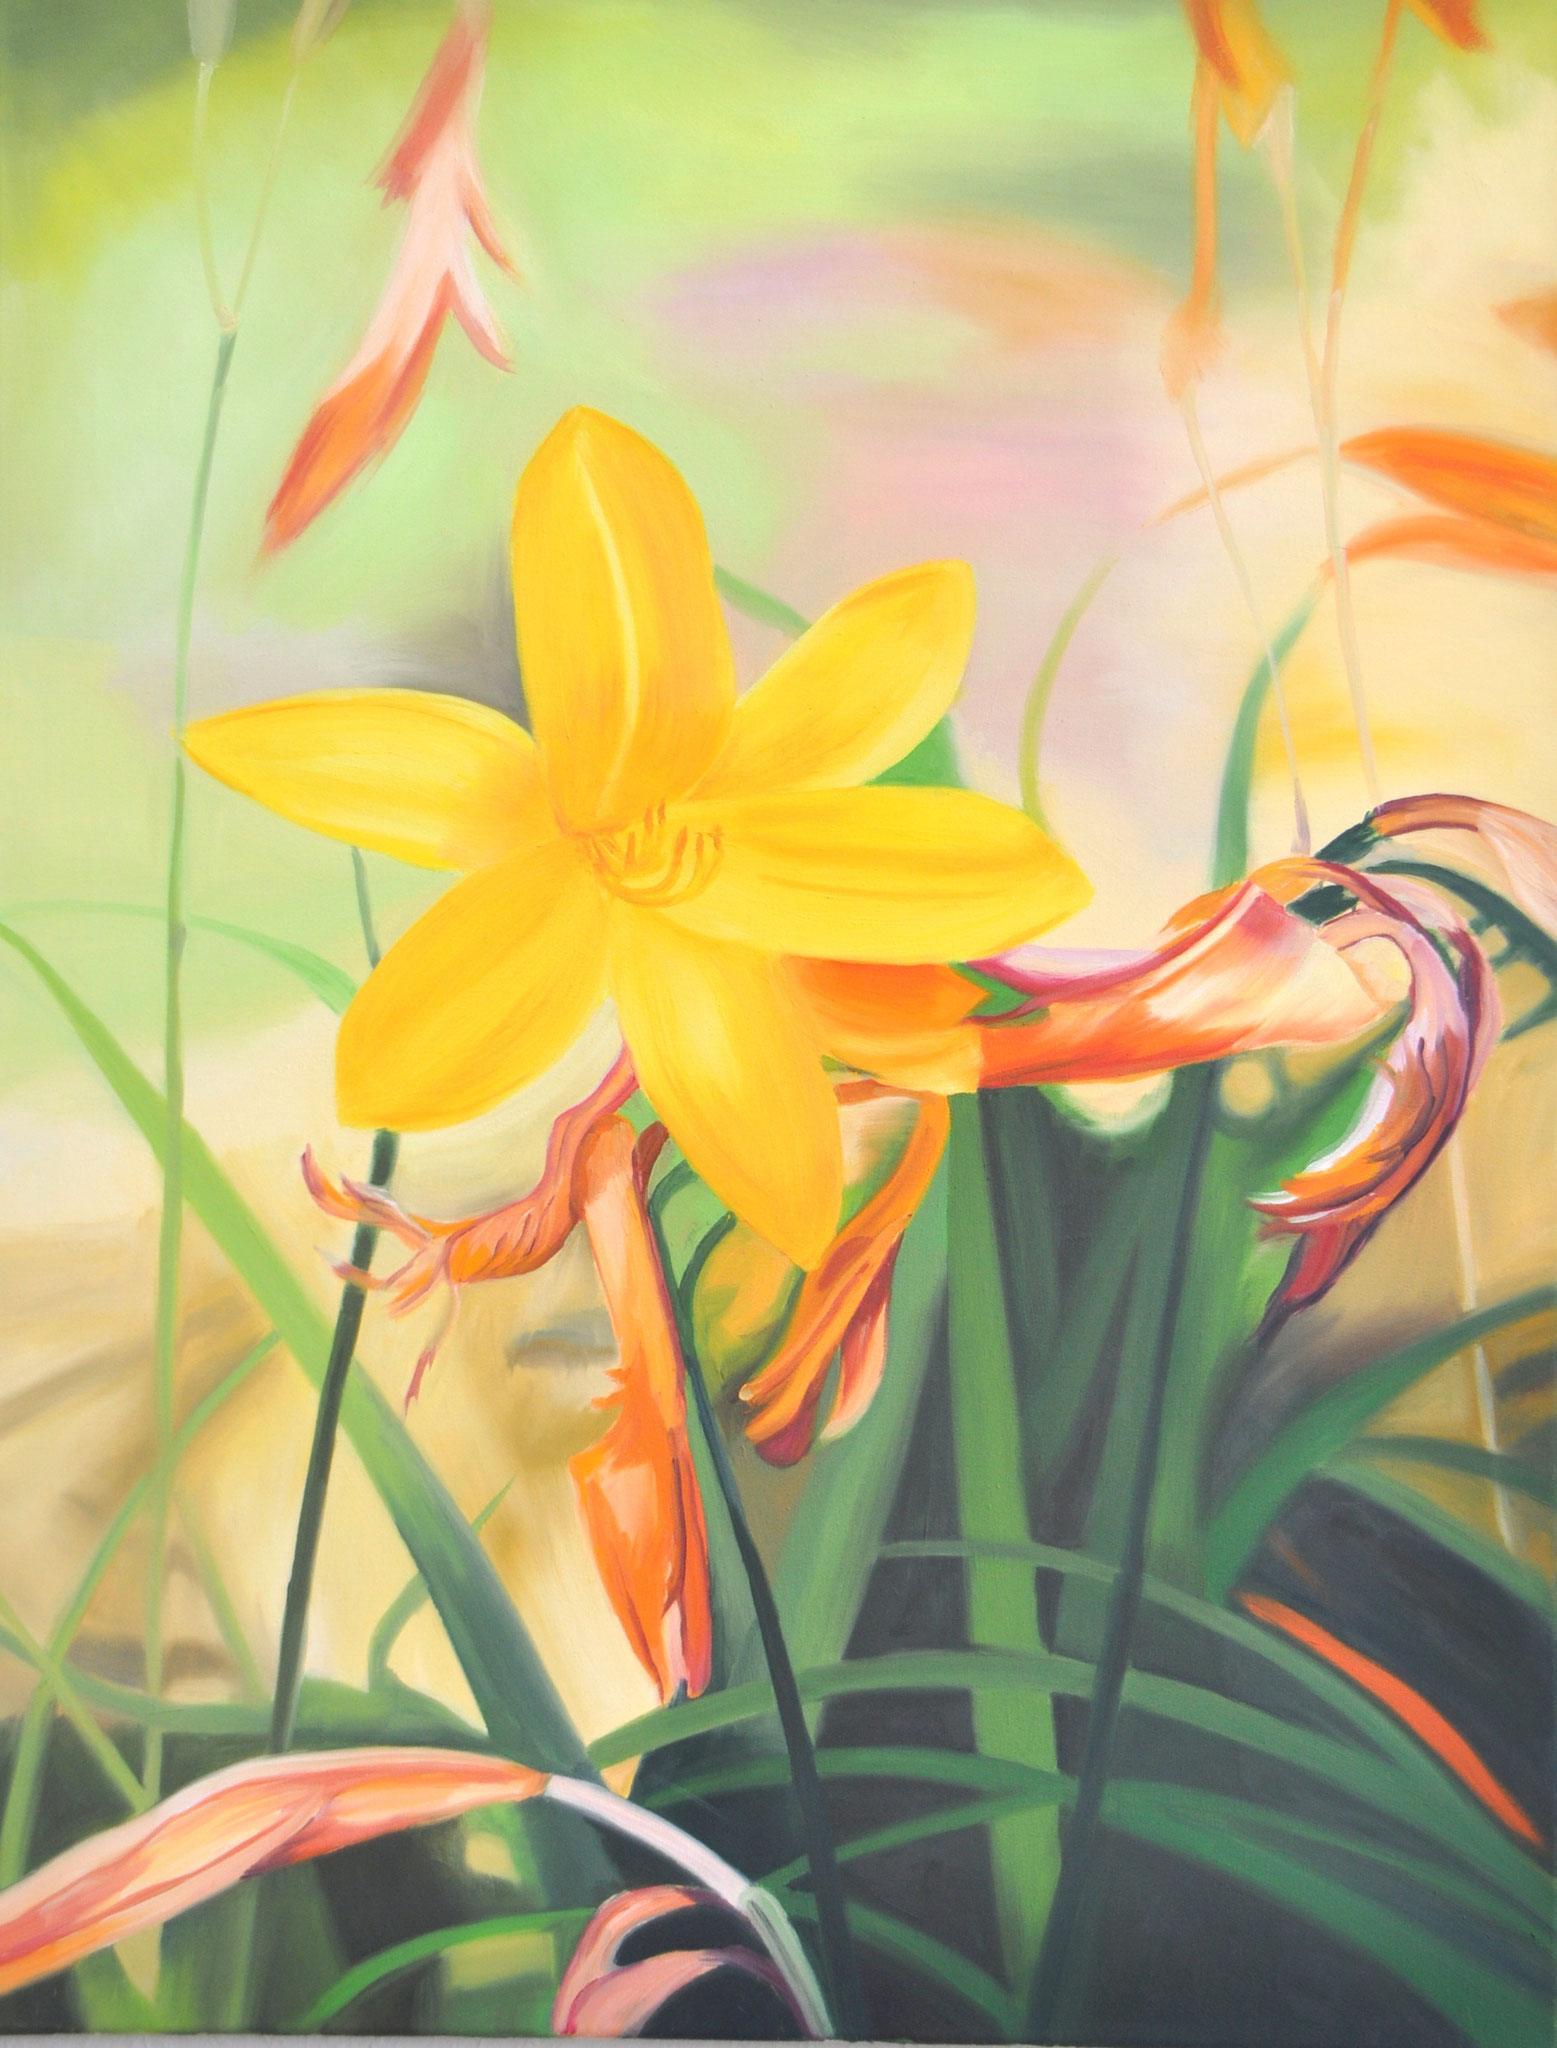 Gelbe Taglilie, 78 x 60 cm